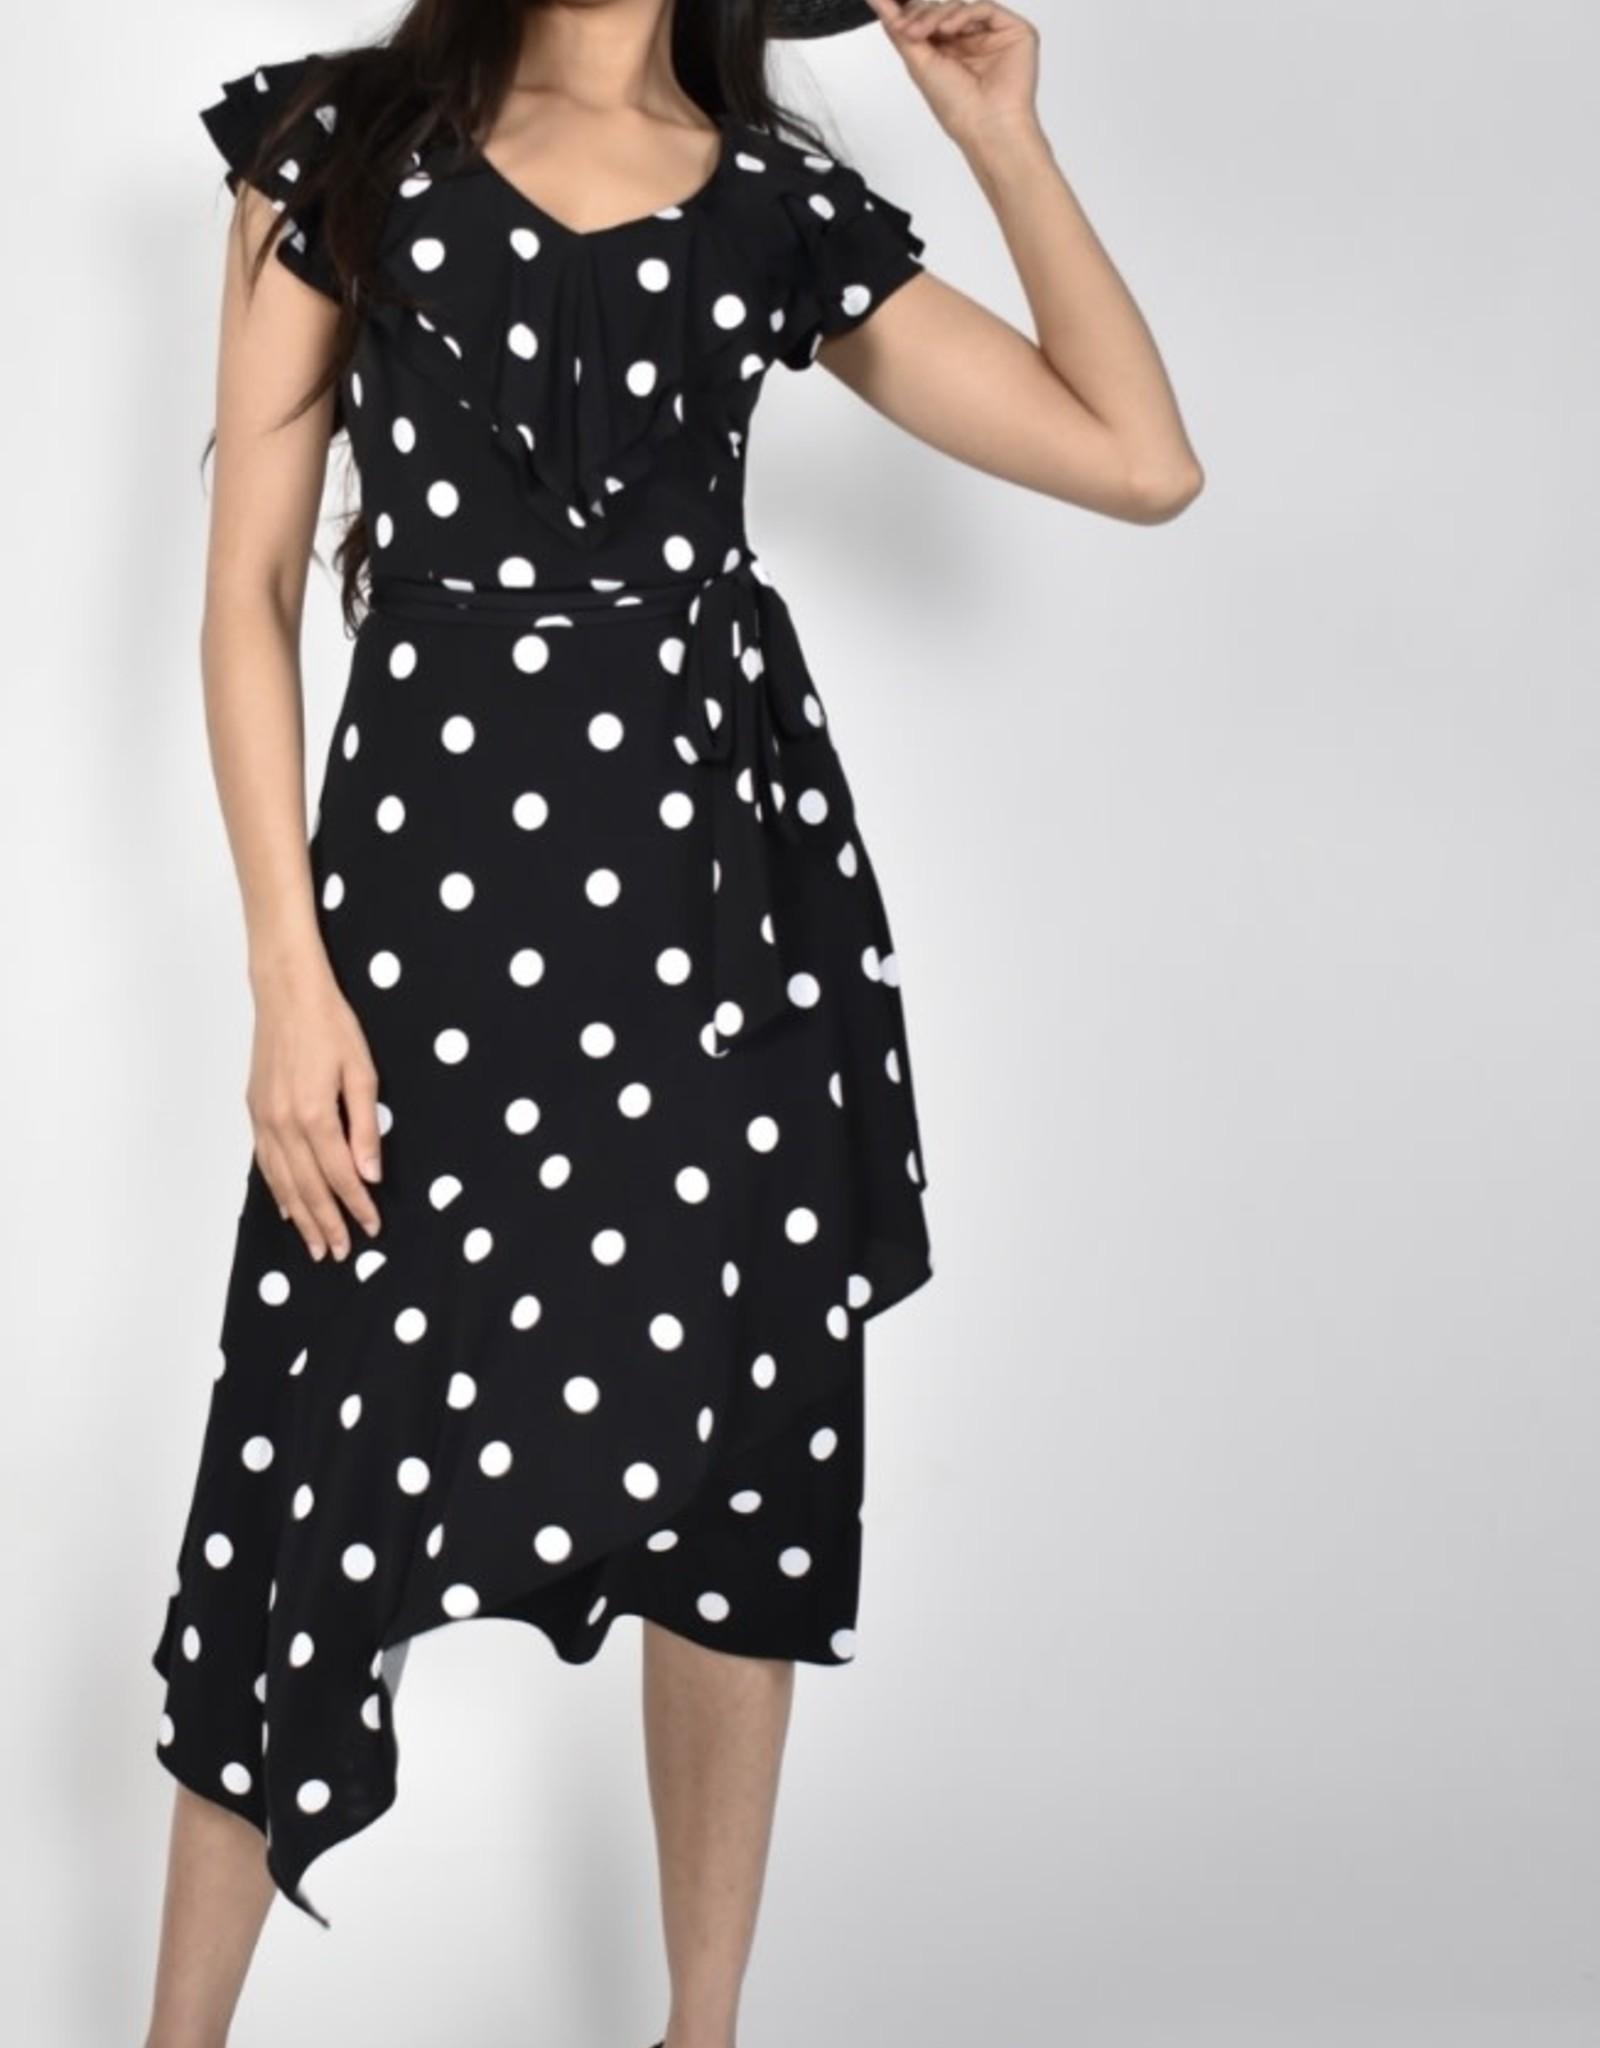 Frank Lyman Black/White Ruffle  Dress